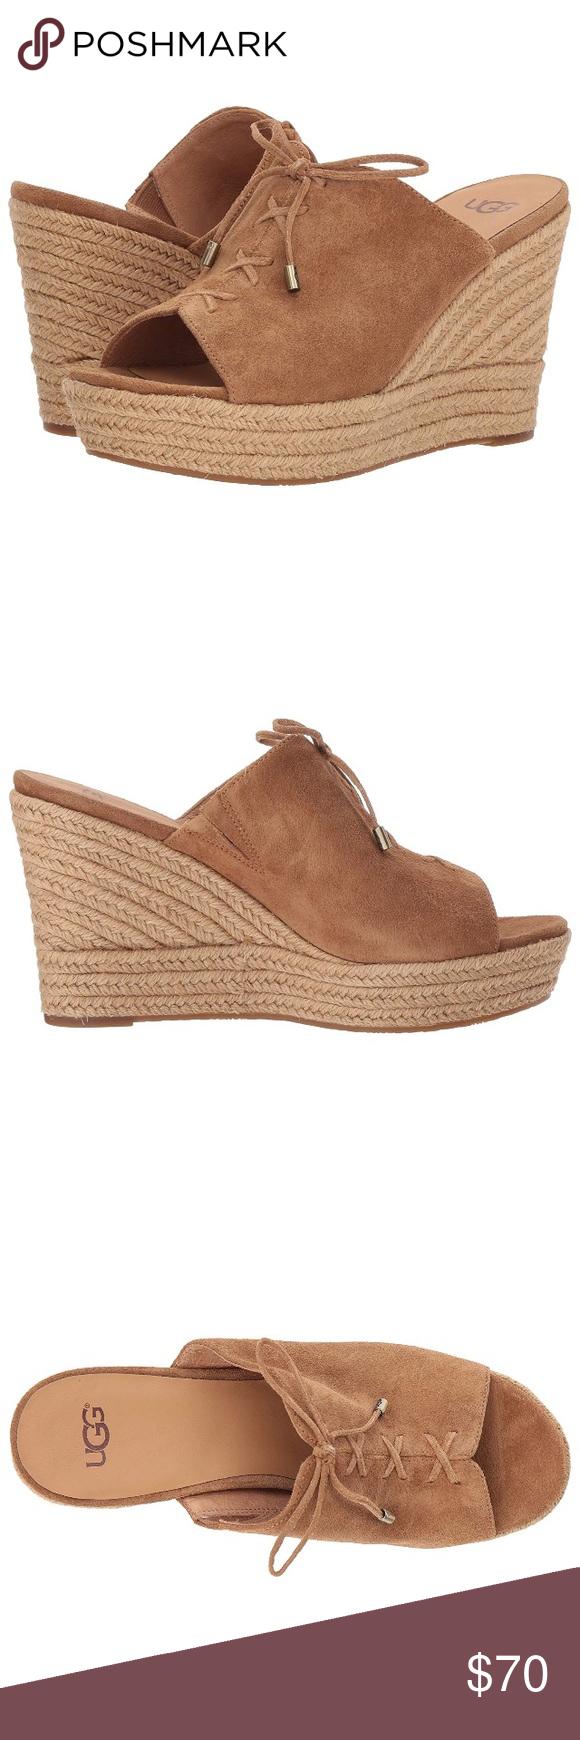 354c856f0cb UGG Women's Giorgia Wedge Sandal Size 12 NWOT Beautiful UGG Sandals ...